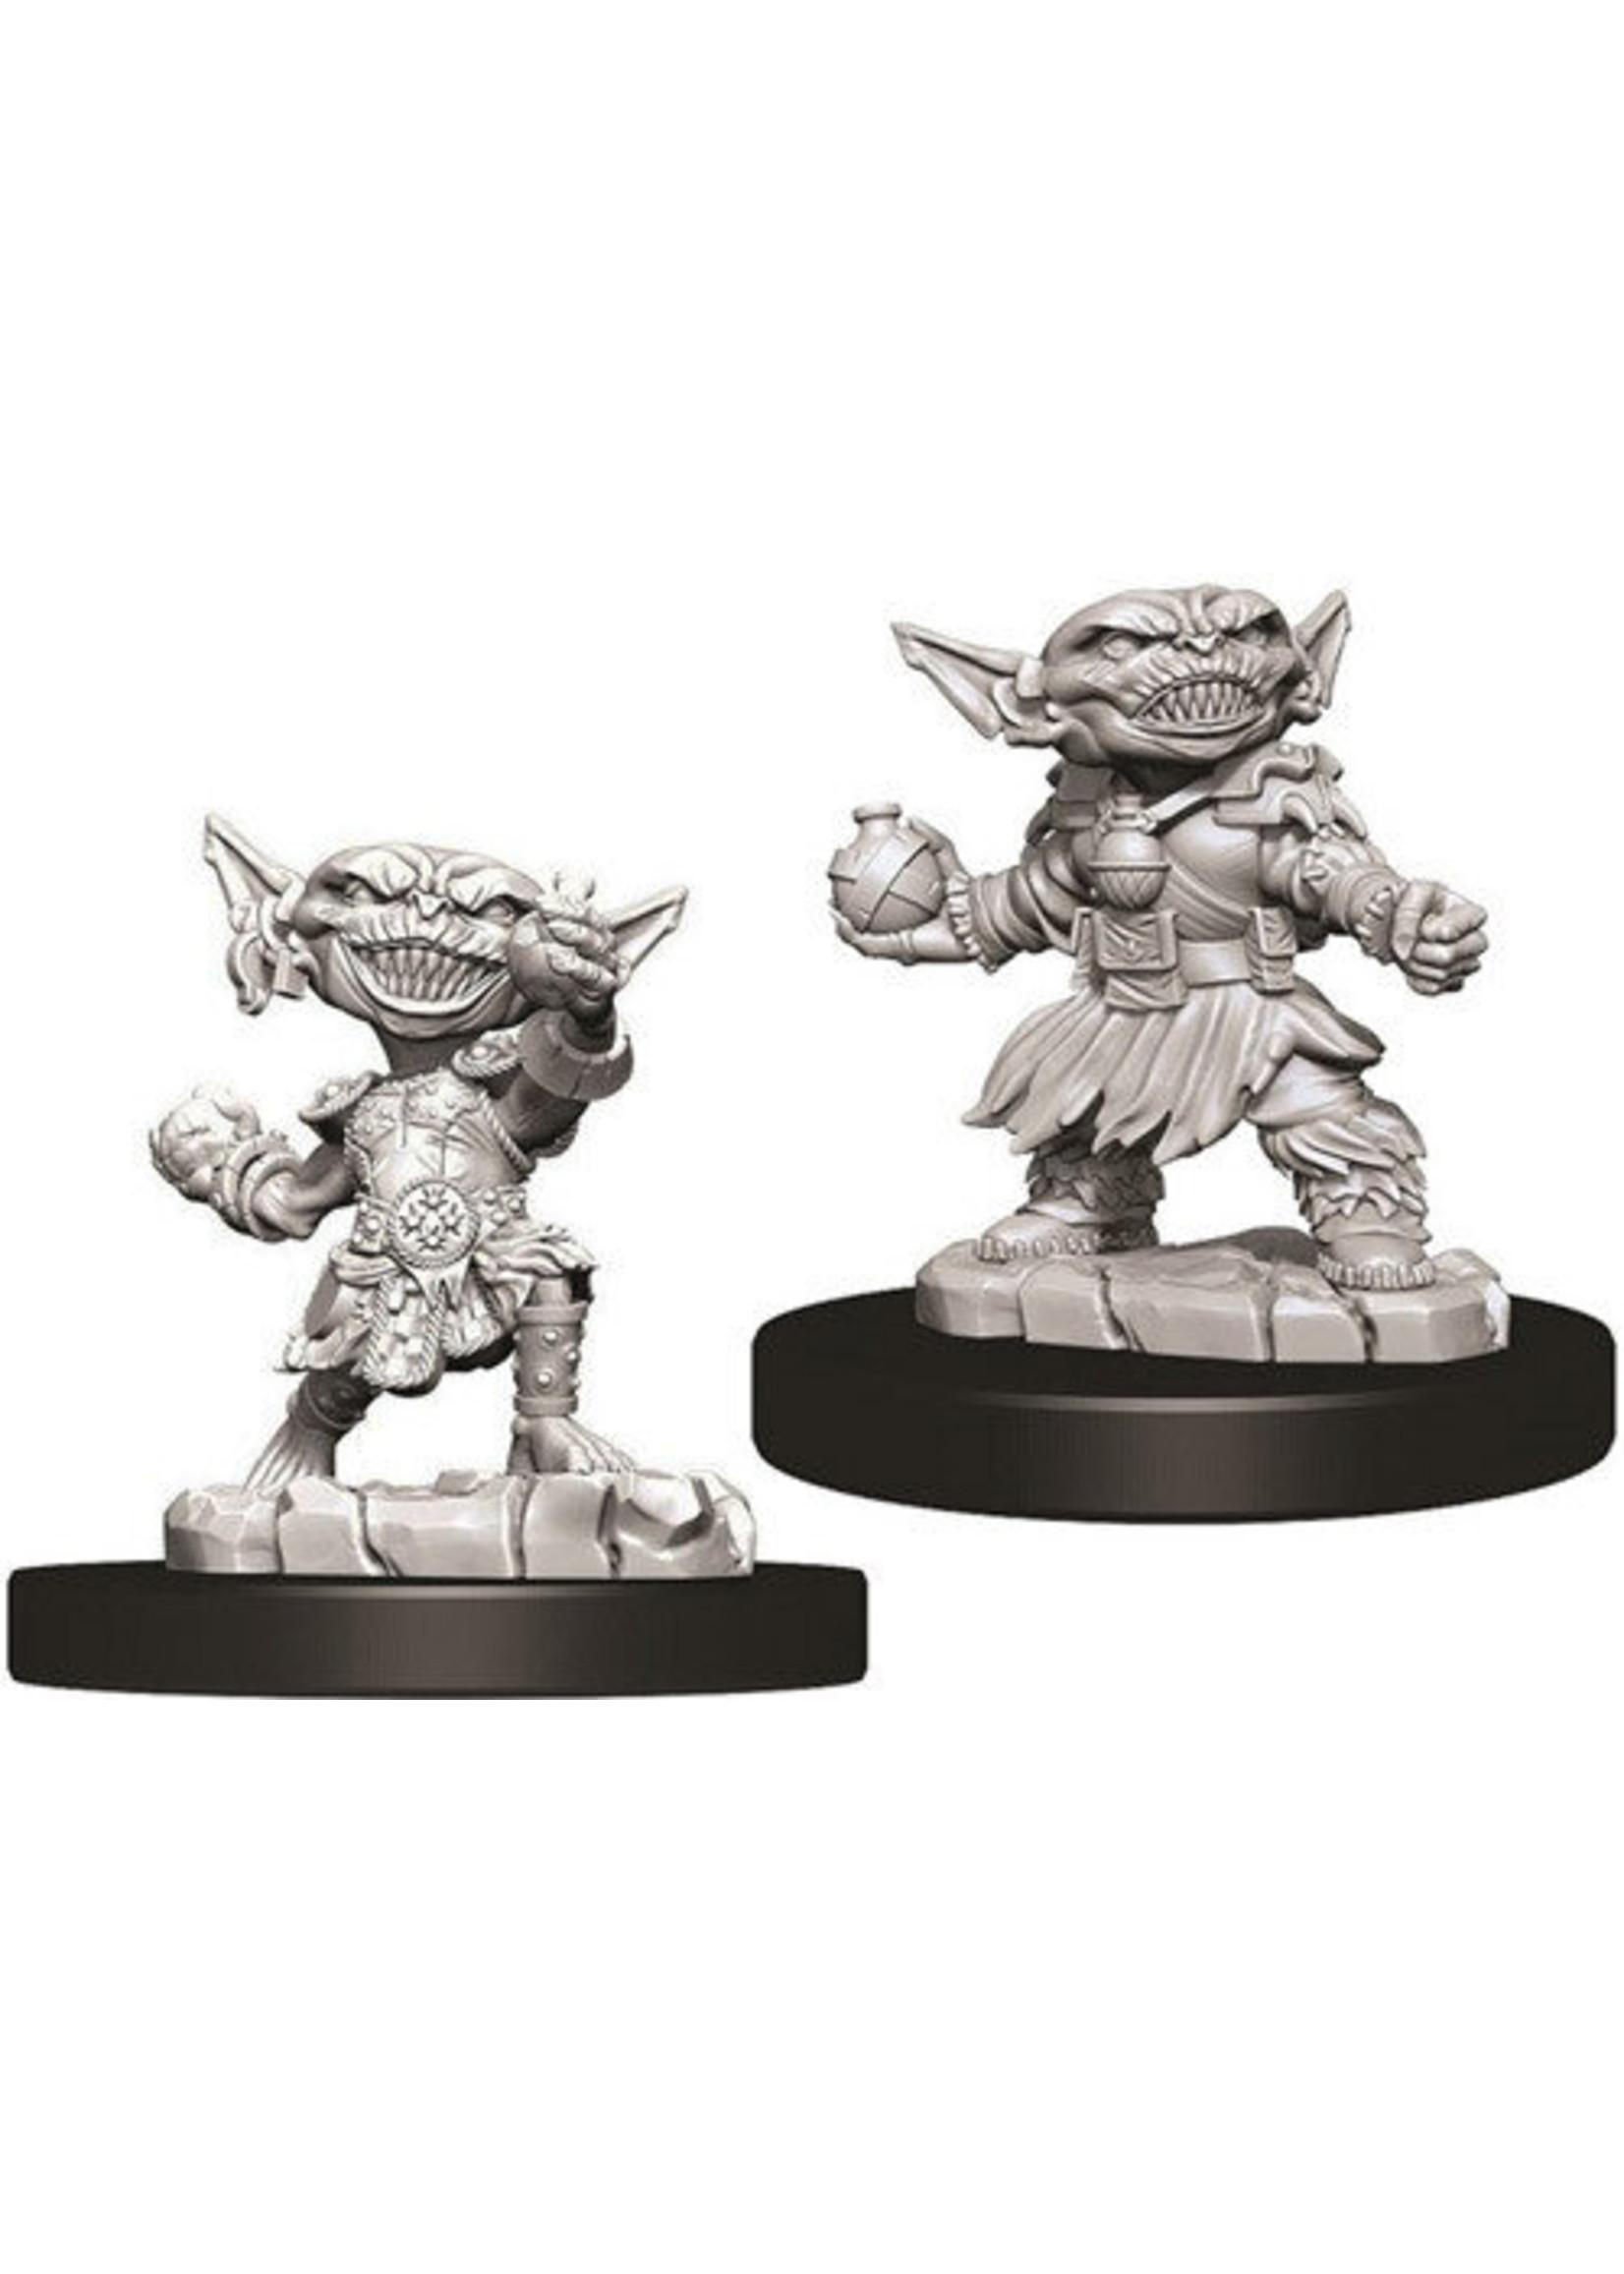 Pathfinder Deep Cuts Unpainted Miniatures: W9 Female Goblin Alchemist